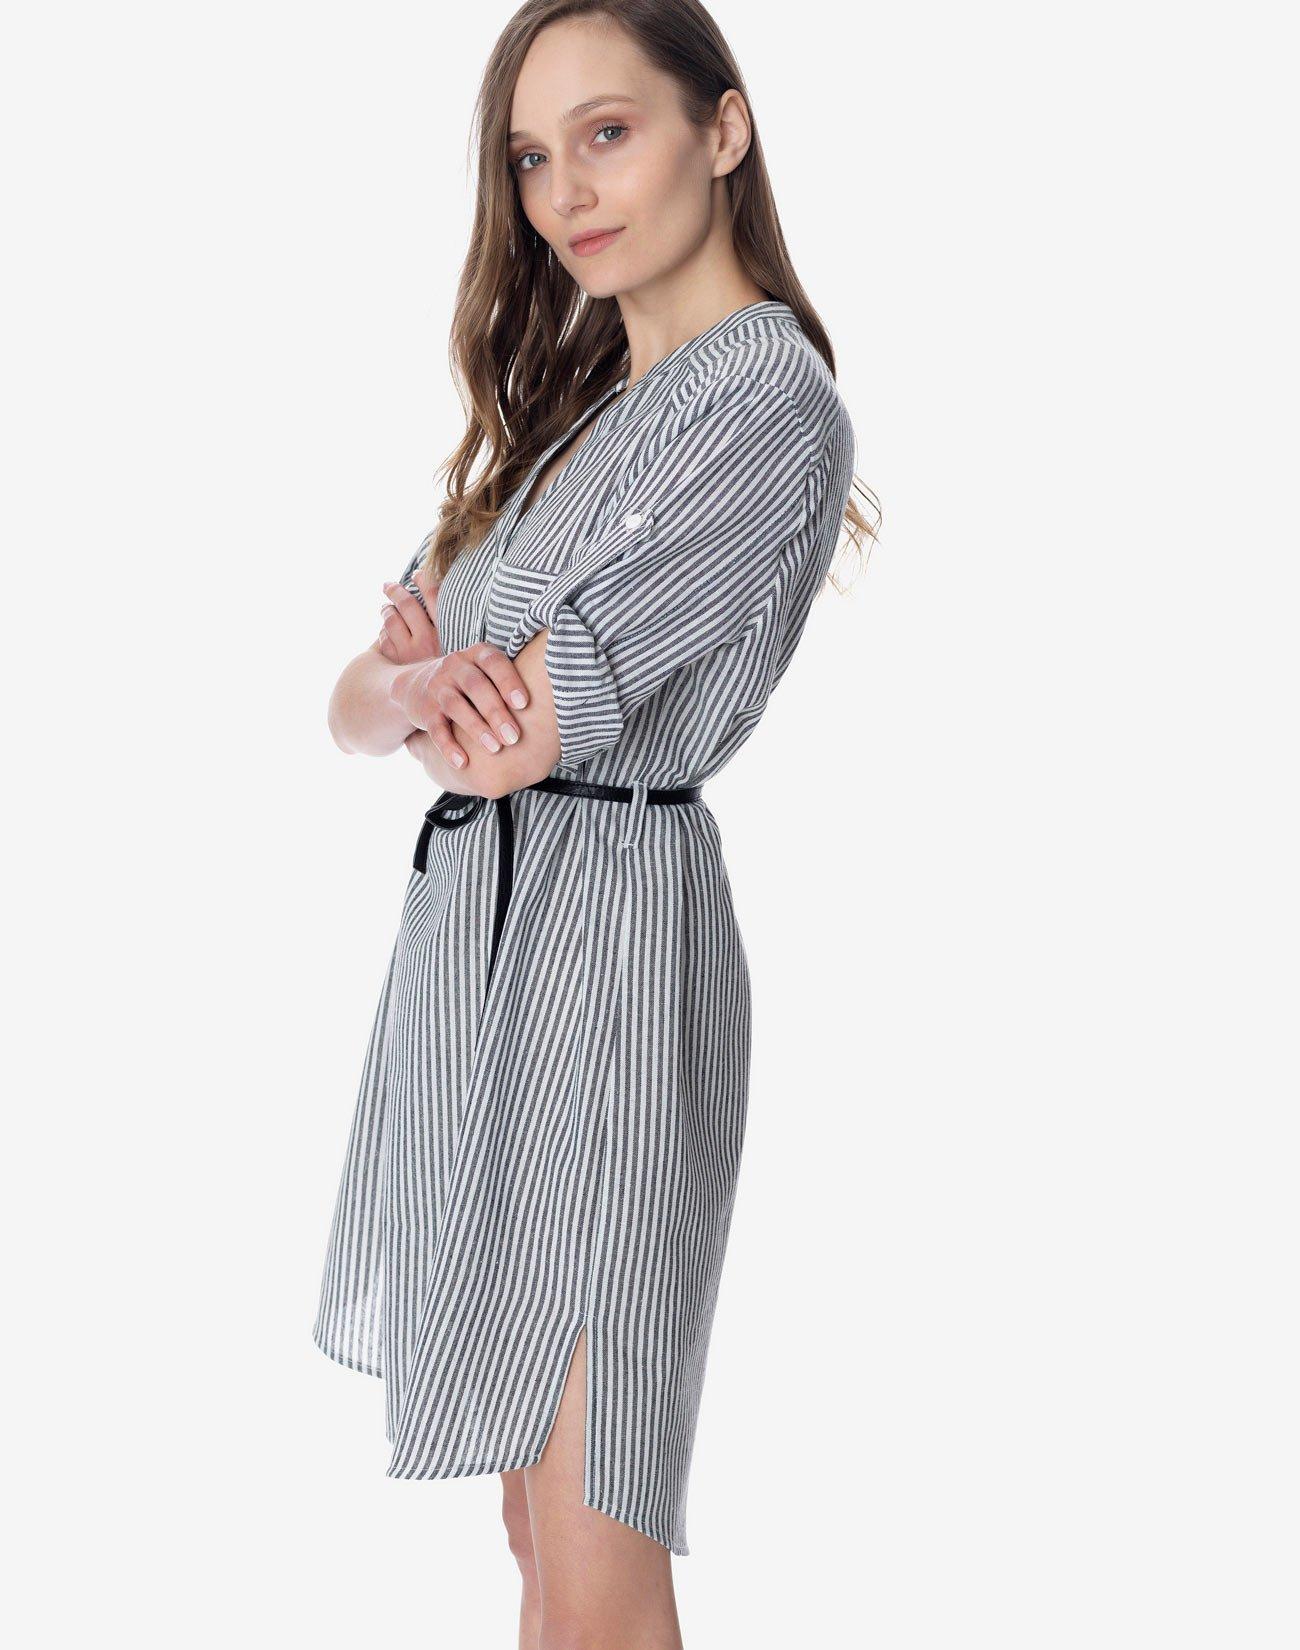 Striped dress with mandarin collar